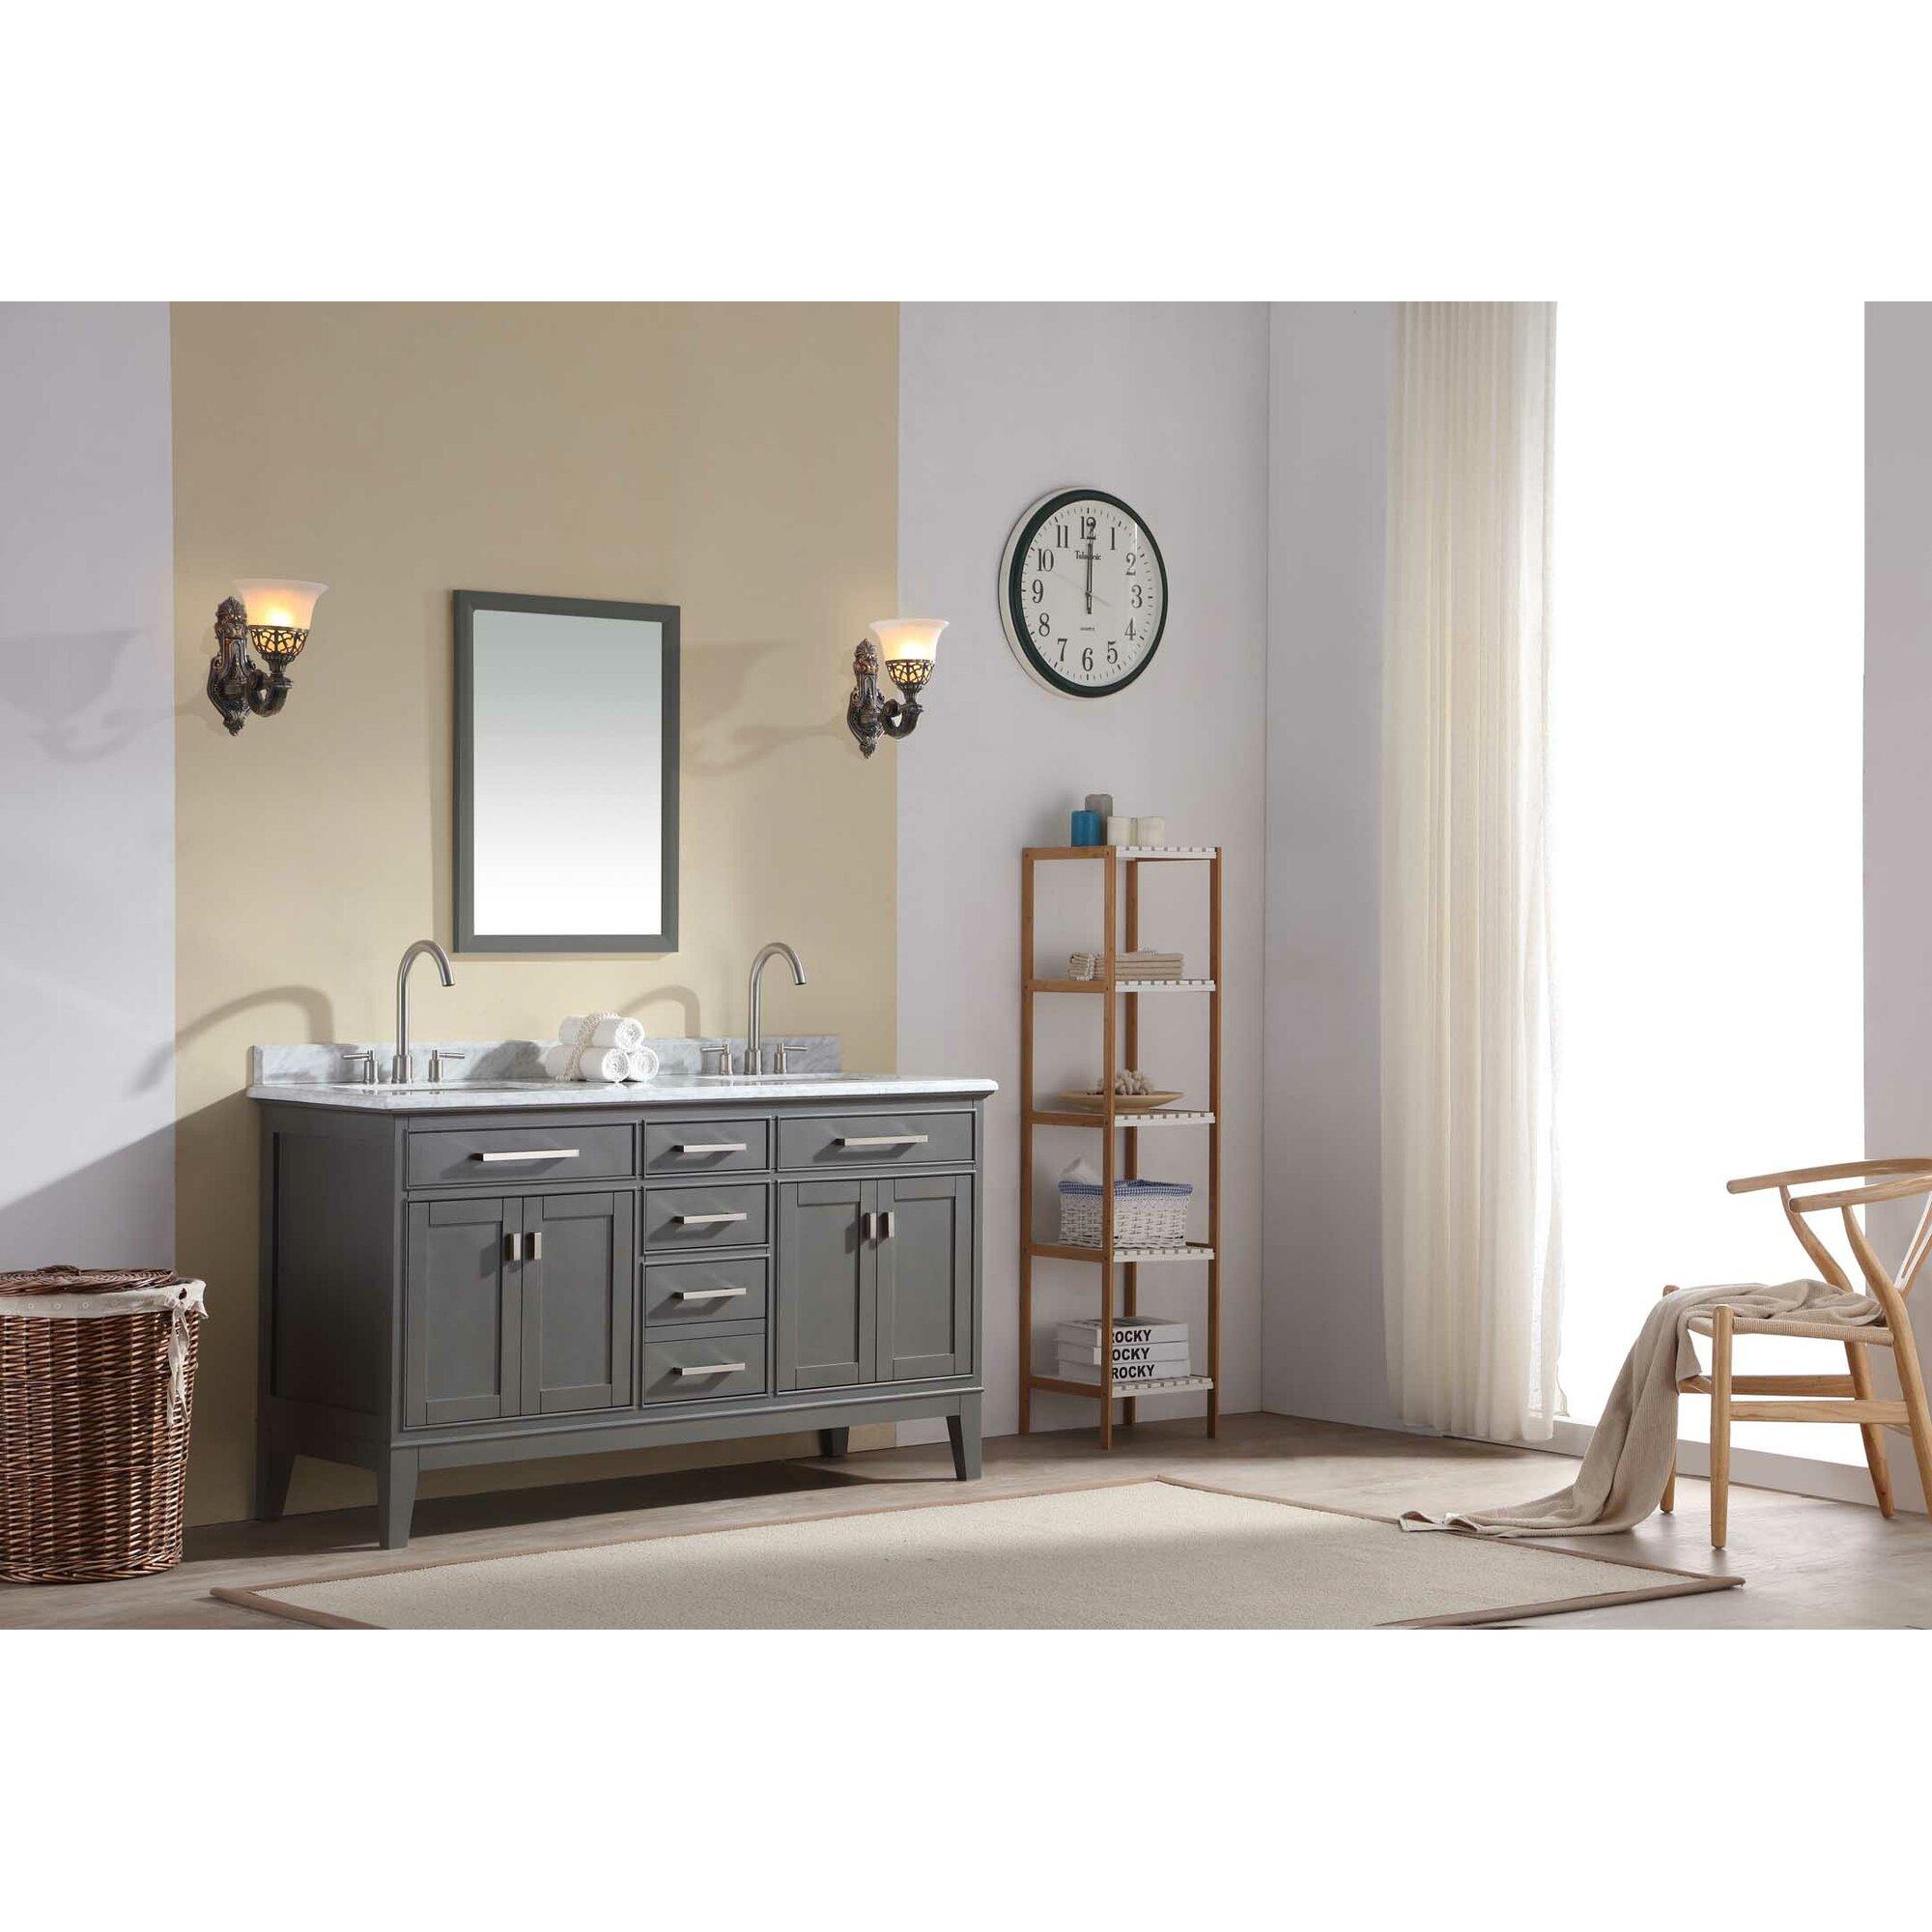 Double bathroom vanity - Danny 60 Double Bathroom Vanity Set